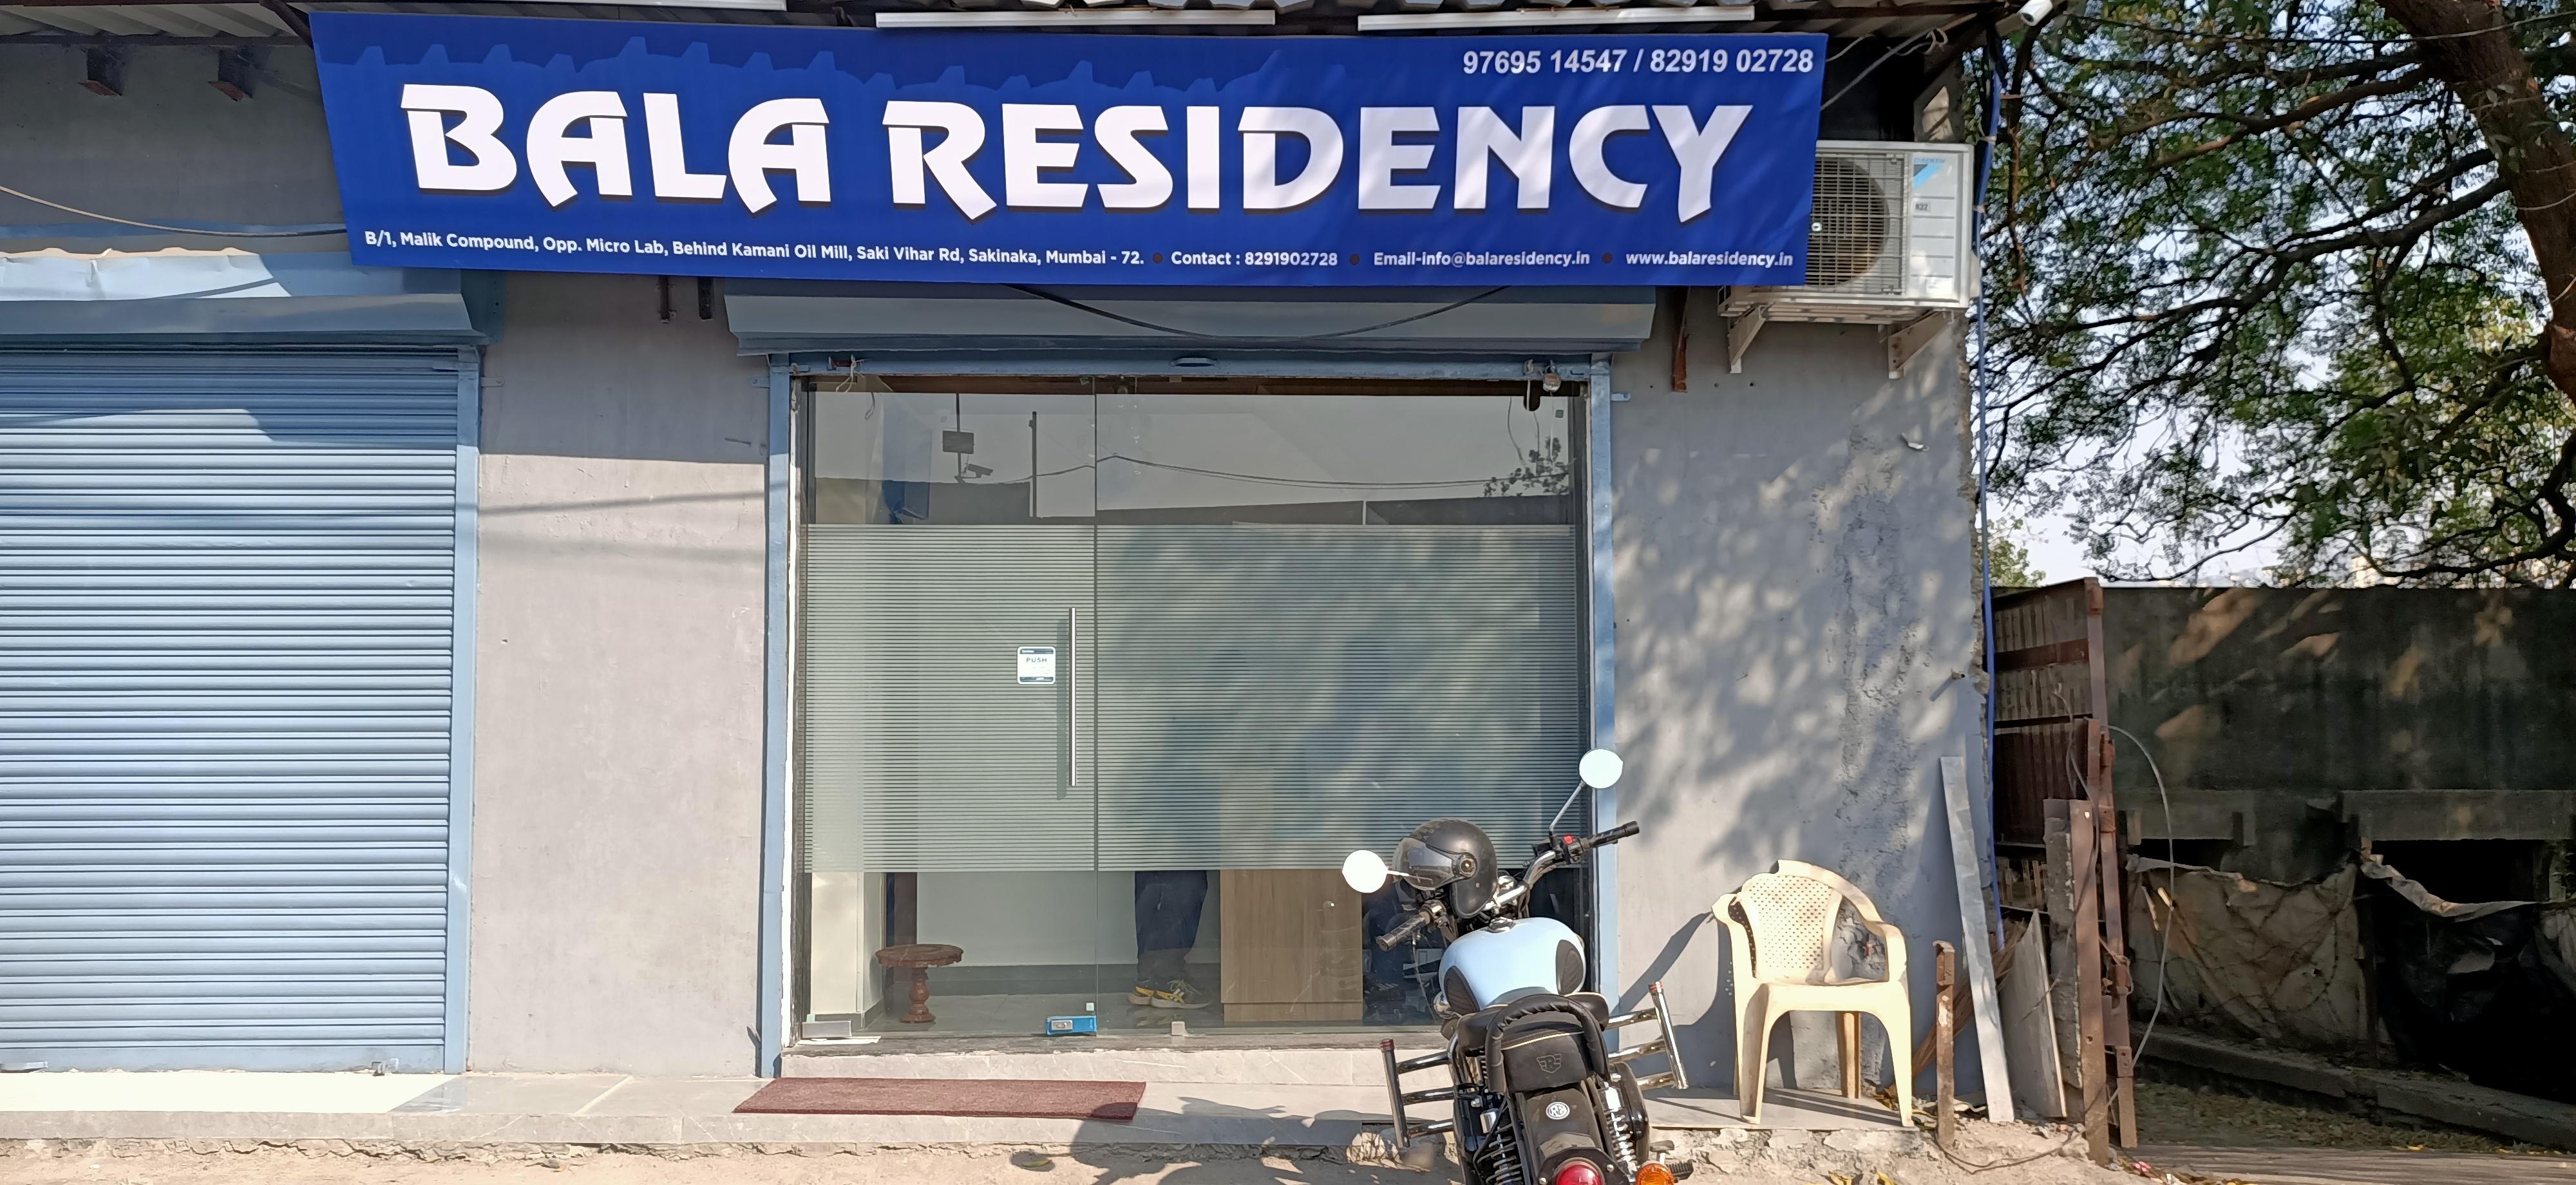 Airport-Hotel-Bala-Residency